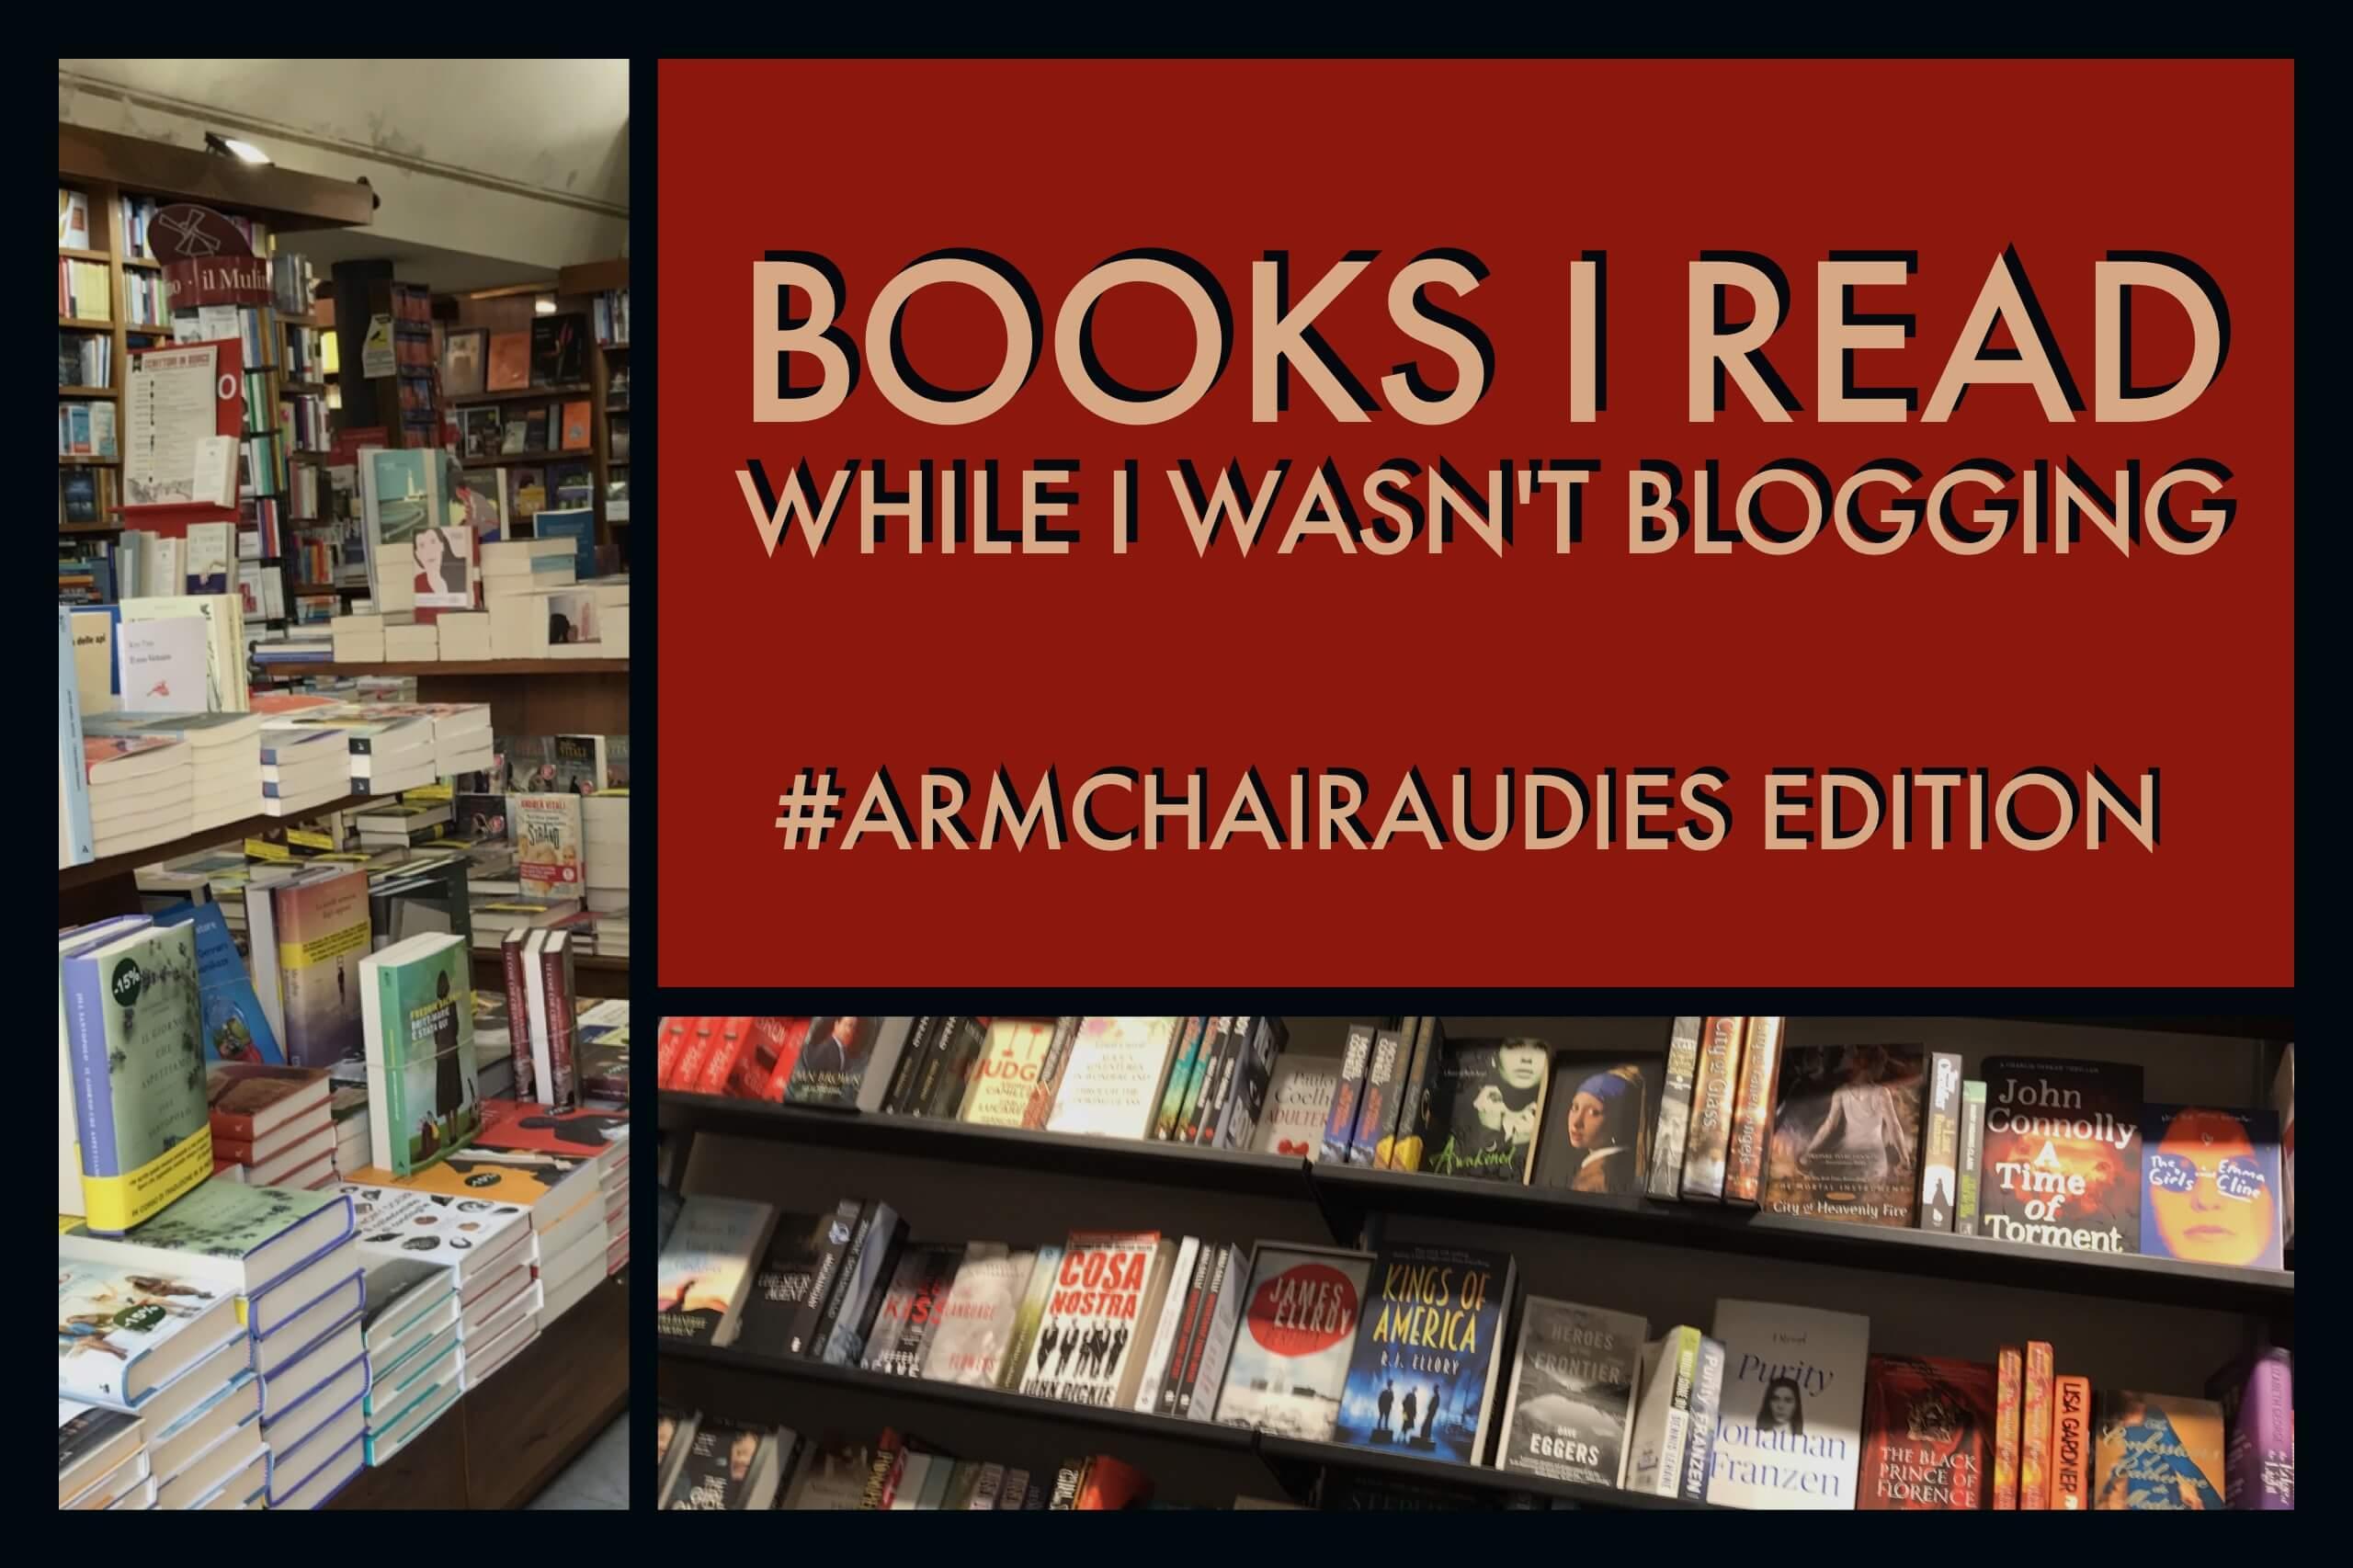 armchair audies audiobooks read